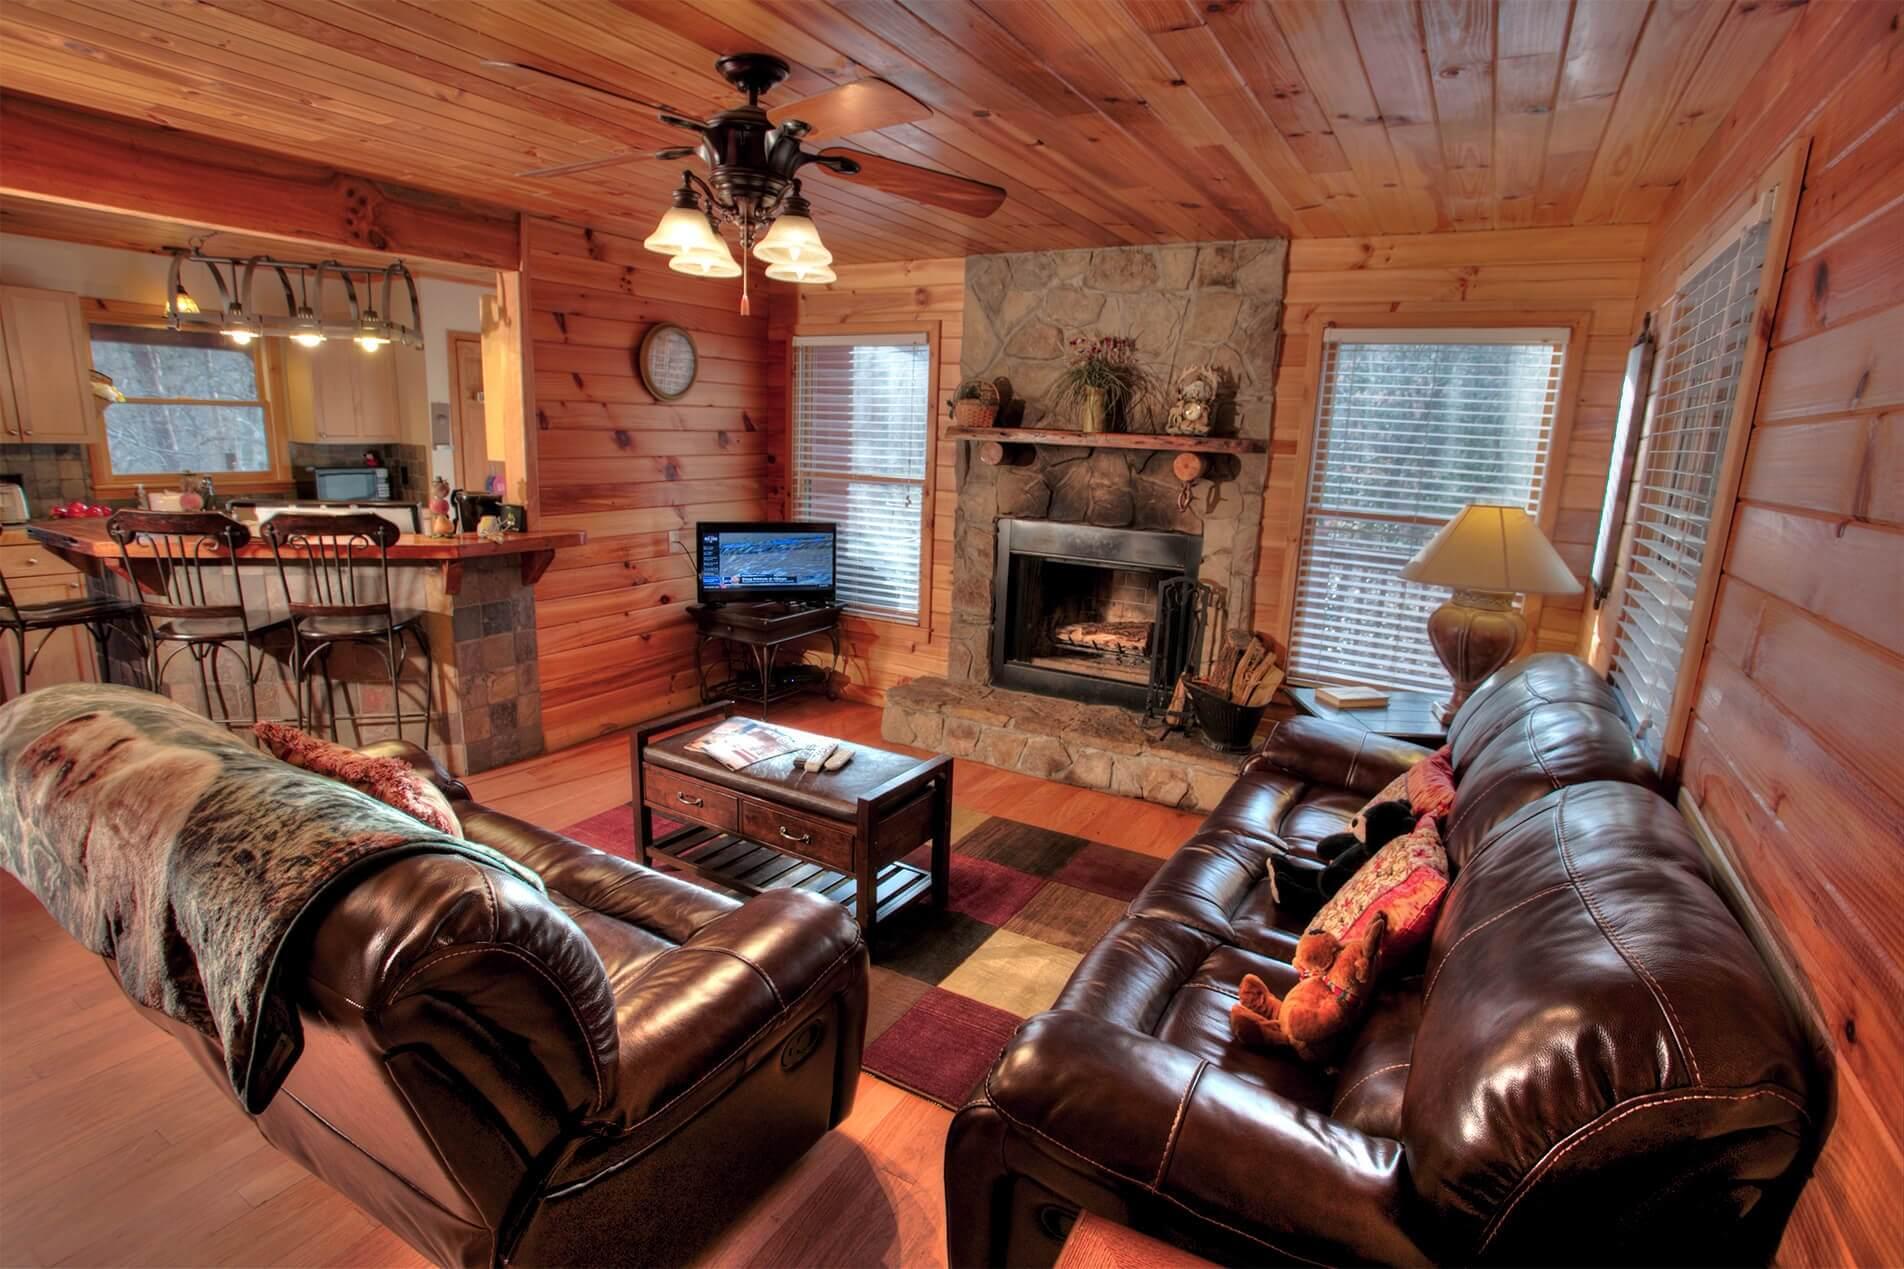 Trout-Lily-Cedar-Creek-Cabin-Rentals-Helen-Georgia-top-banner-tiny